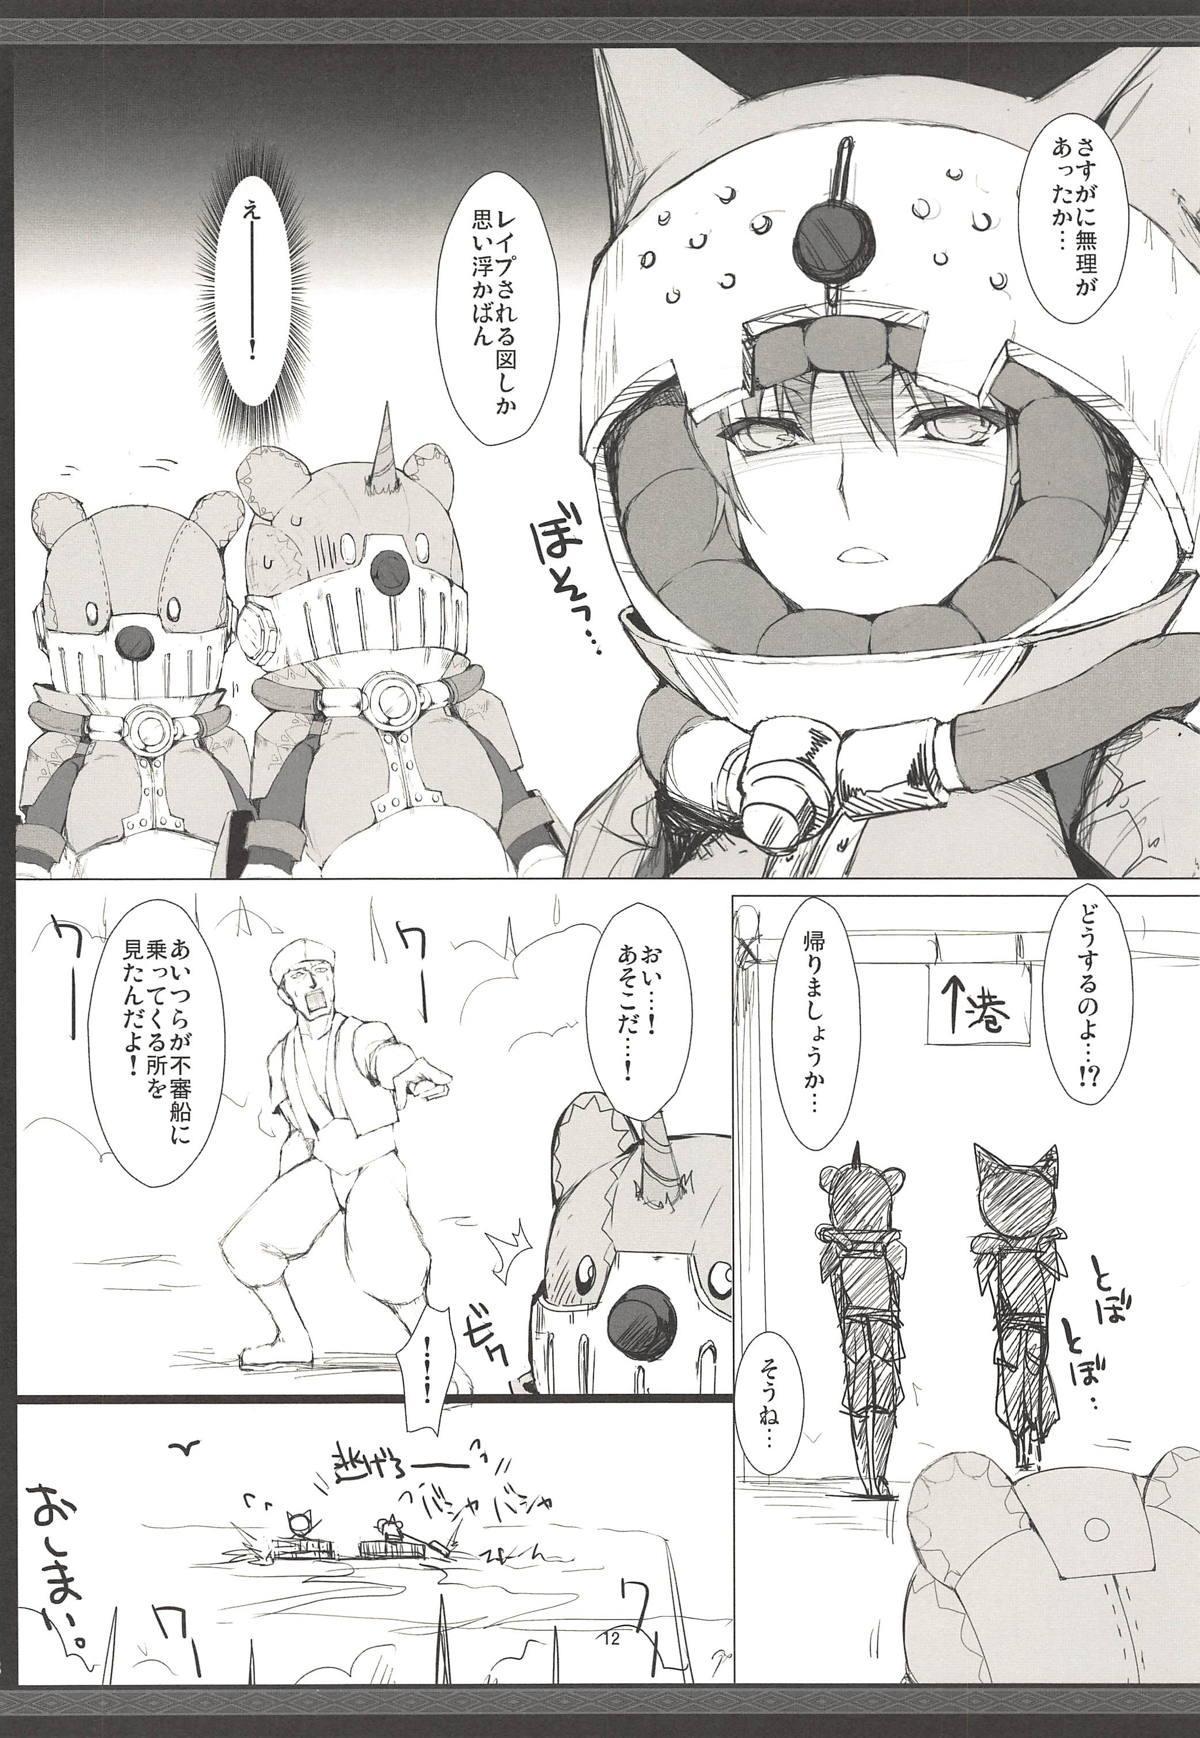 Monhan no Erohon G3 11→14+Juuhi+Omakebon Soushuuhen 66